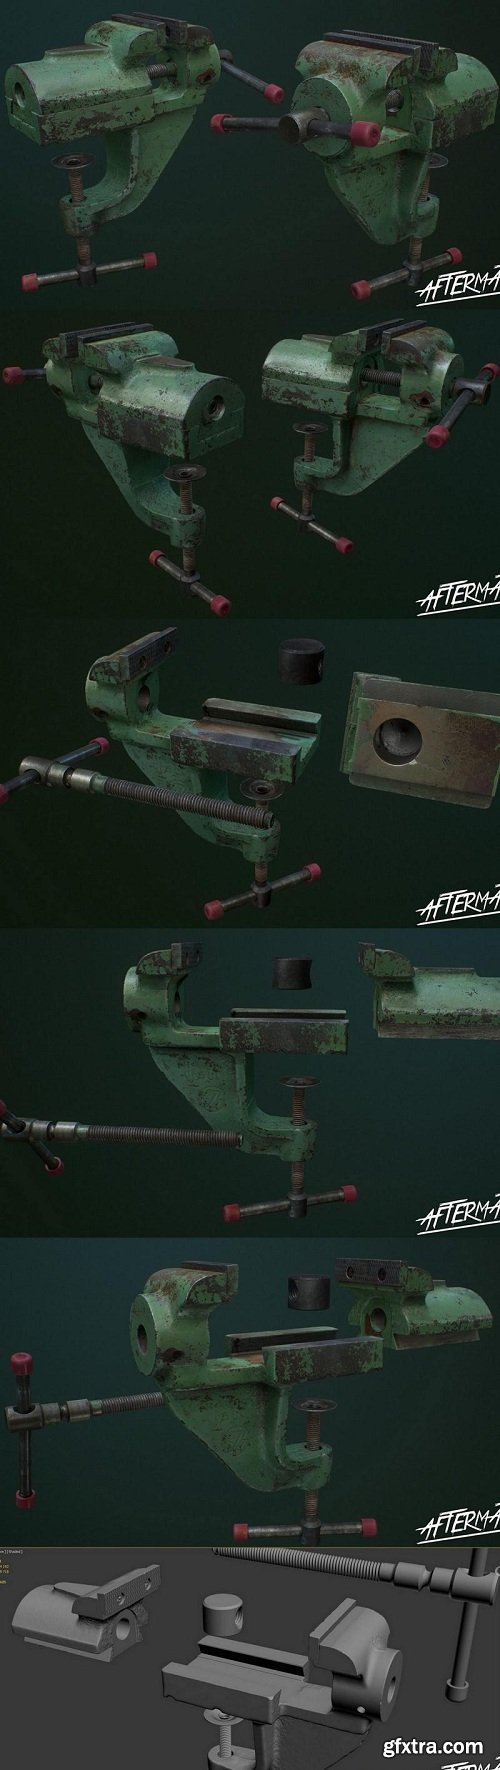 Vices 3D Model